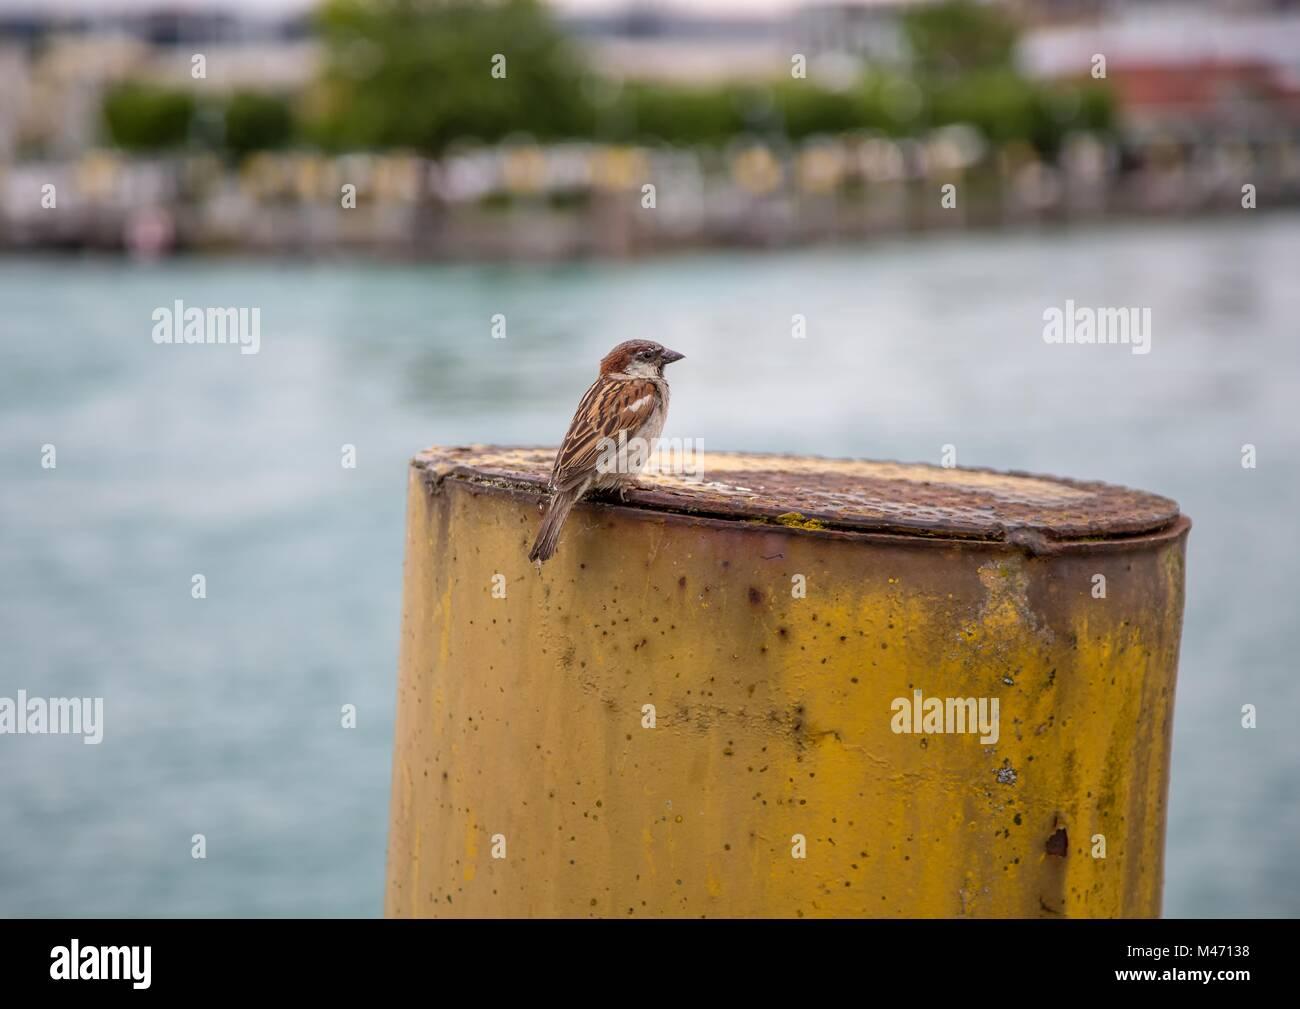 European oscine bird sitting on a pole in Germany - Stock Image